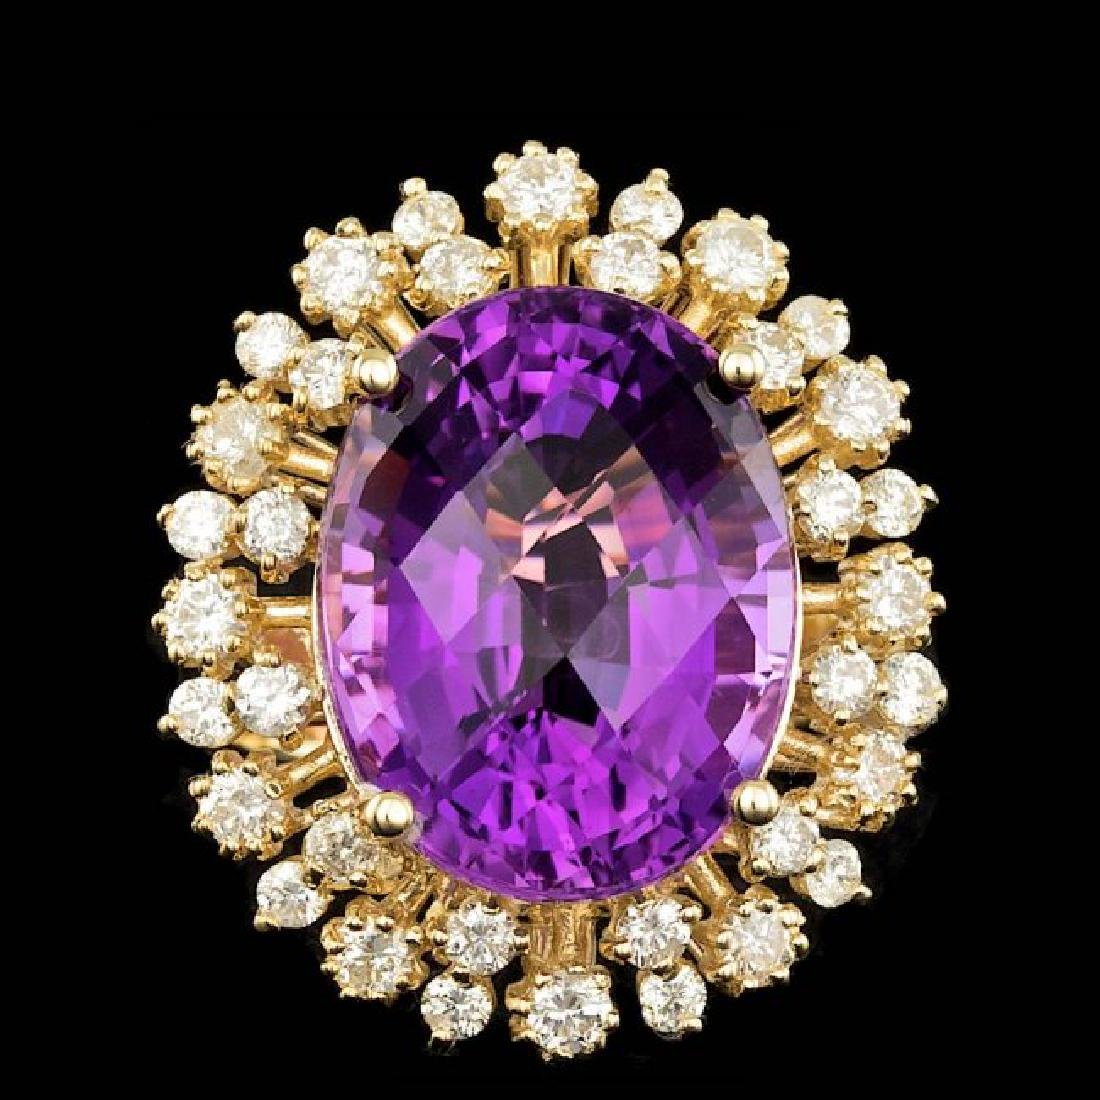 14k Gold 14.00ct Amethyst 1.50ct Diamond Ring